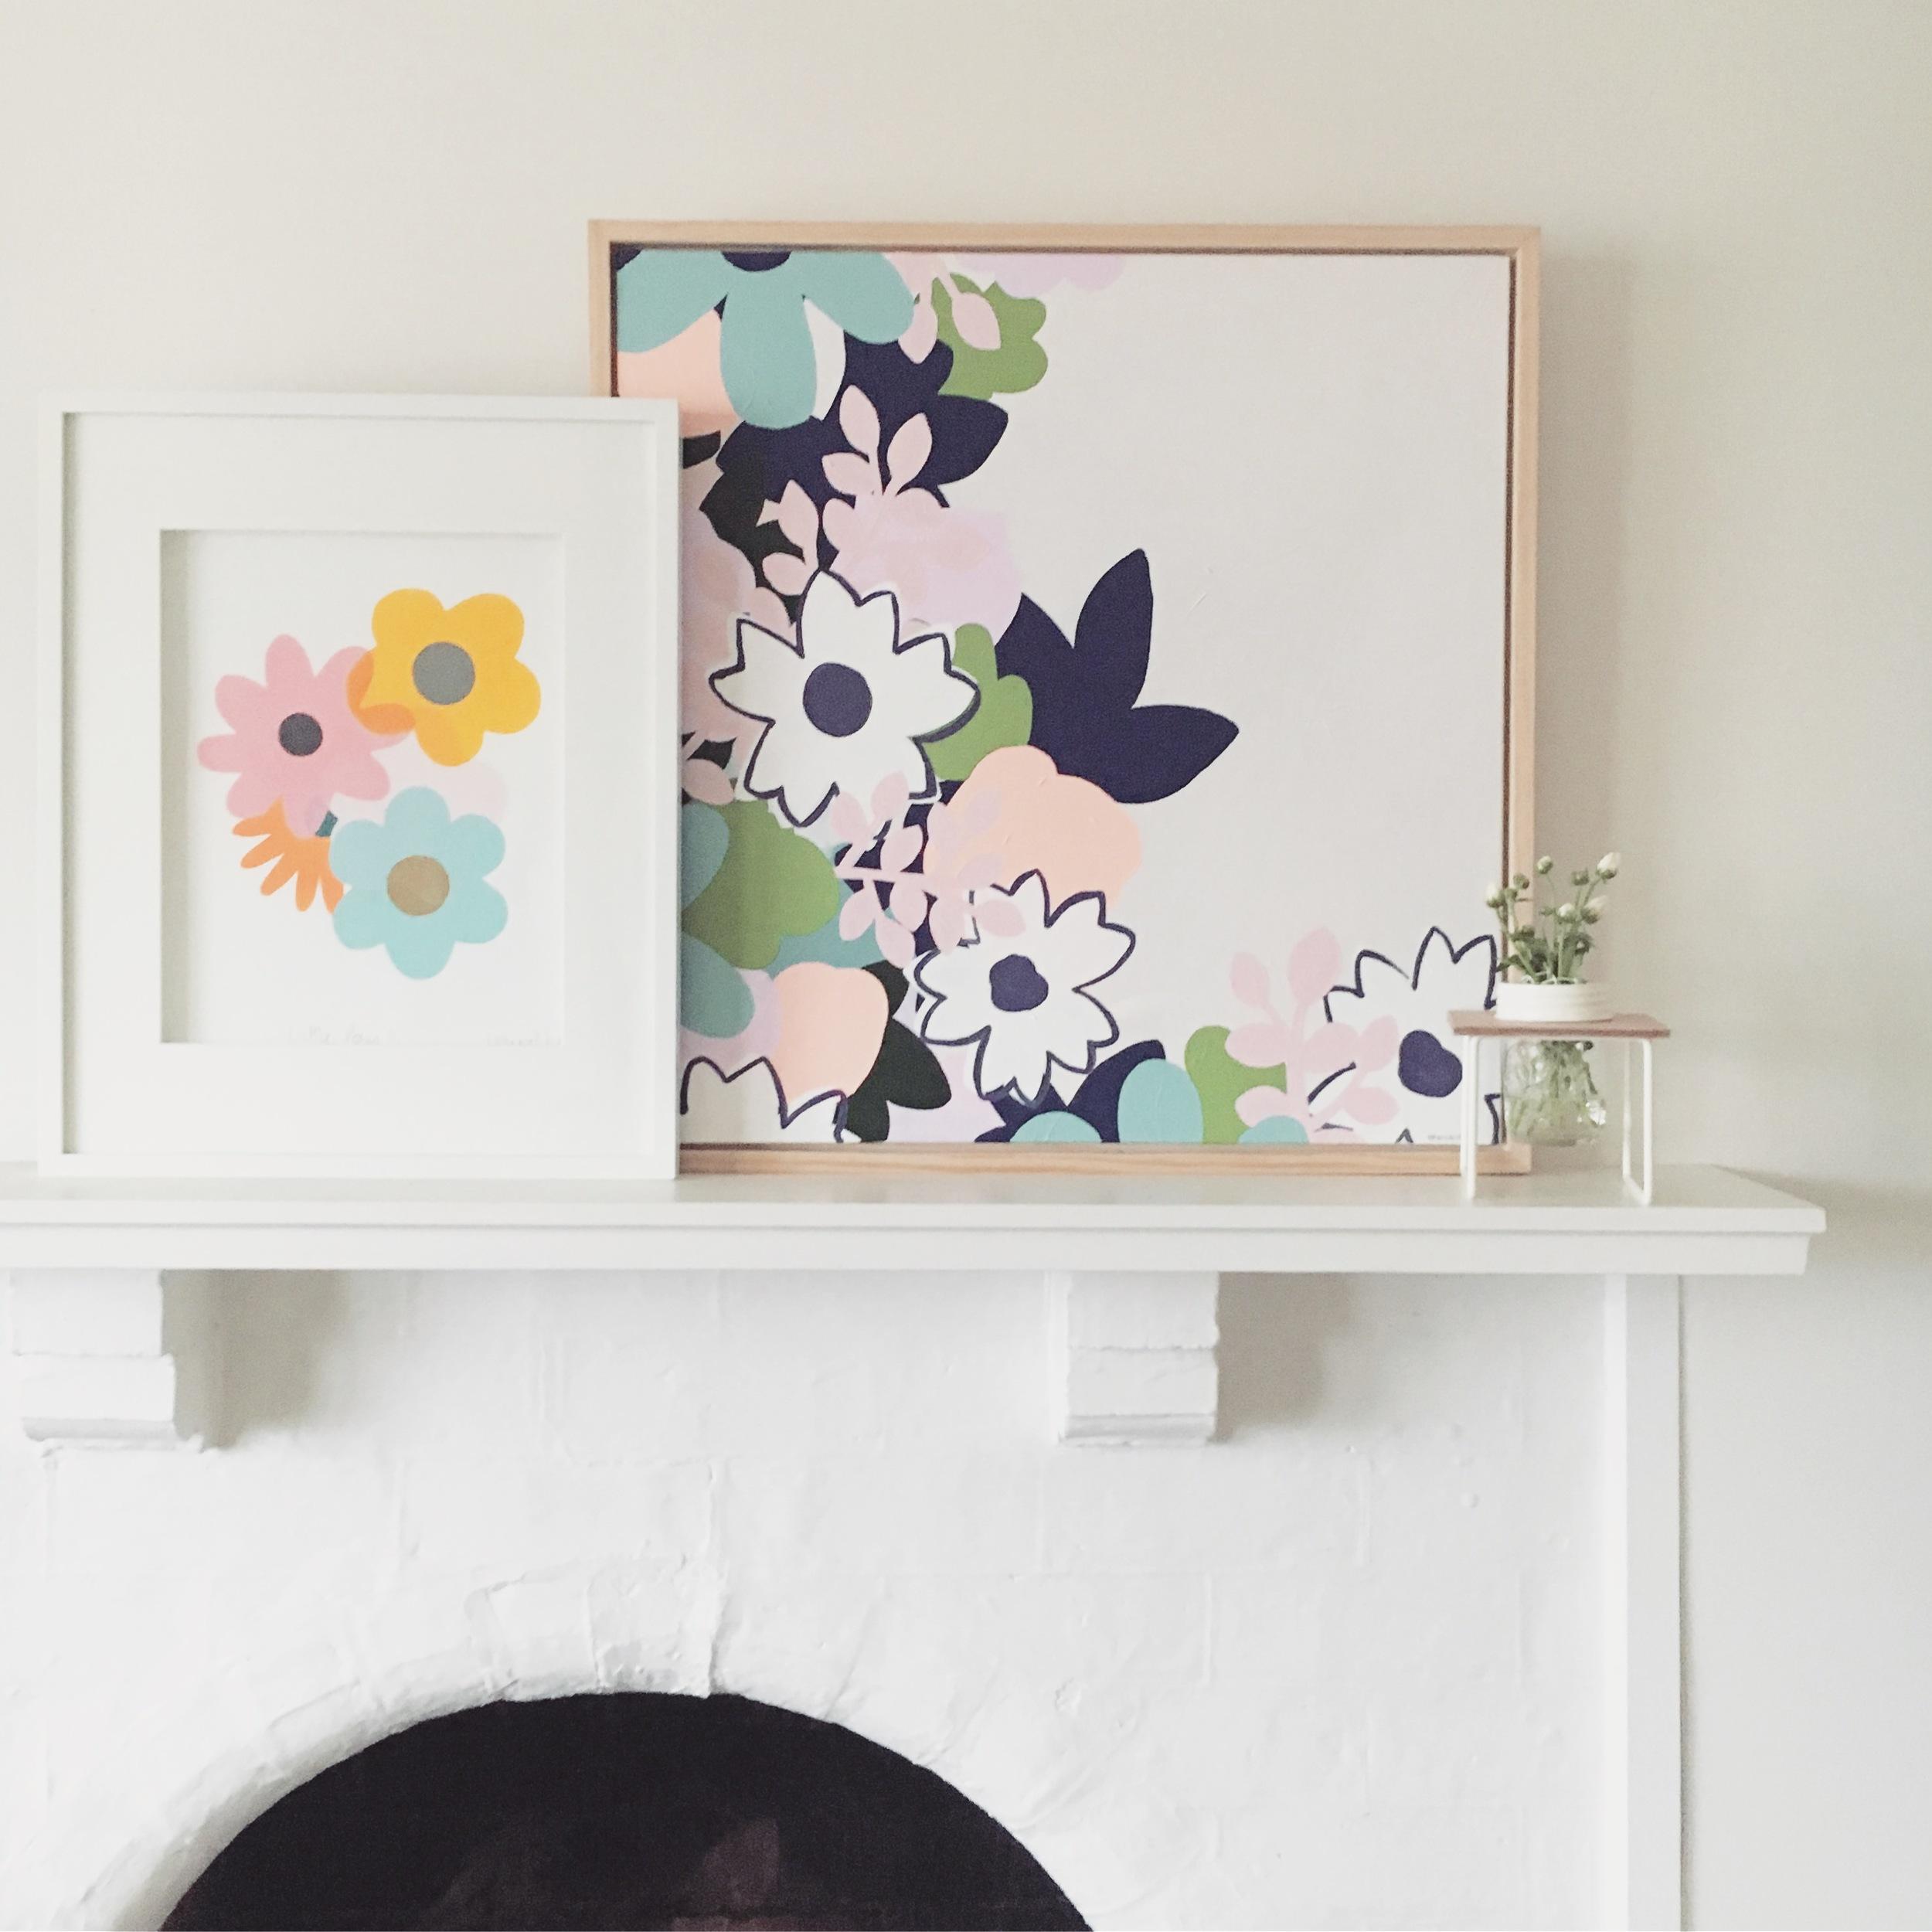 Posy Print by Lauren Smallfield Creates. Pink Lemonade Painting by Rebecca Kate Artist.